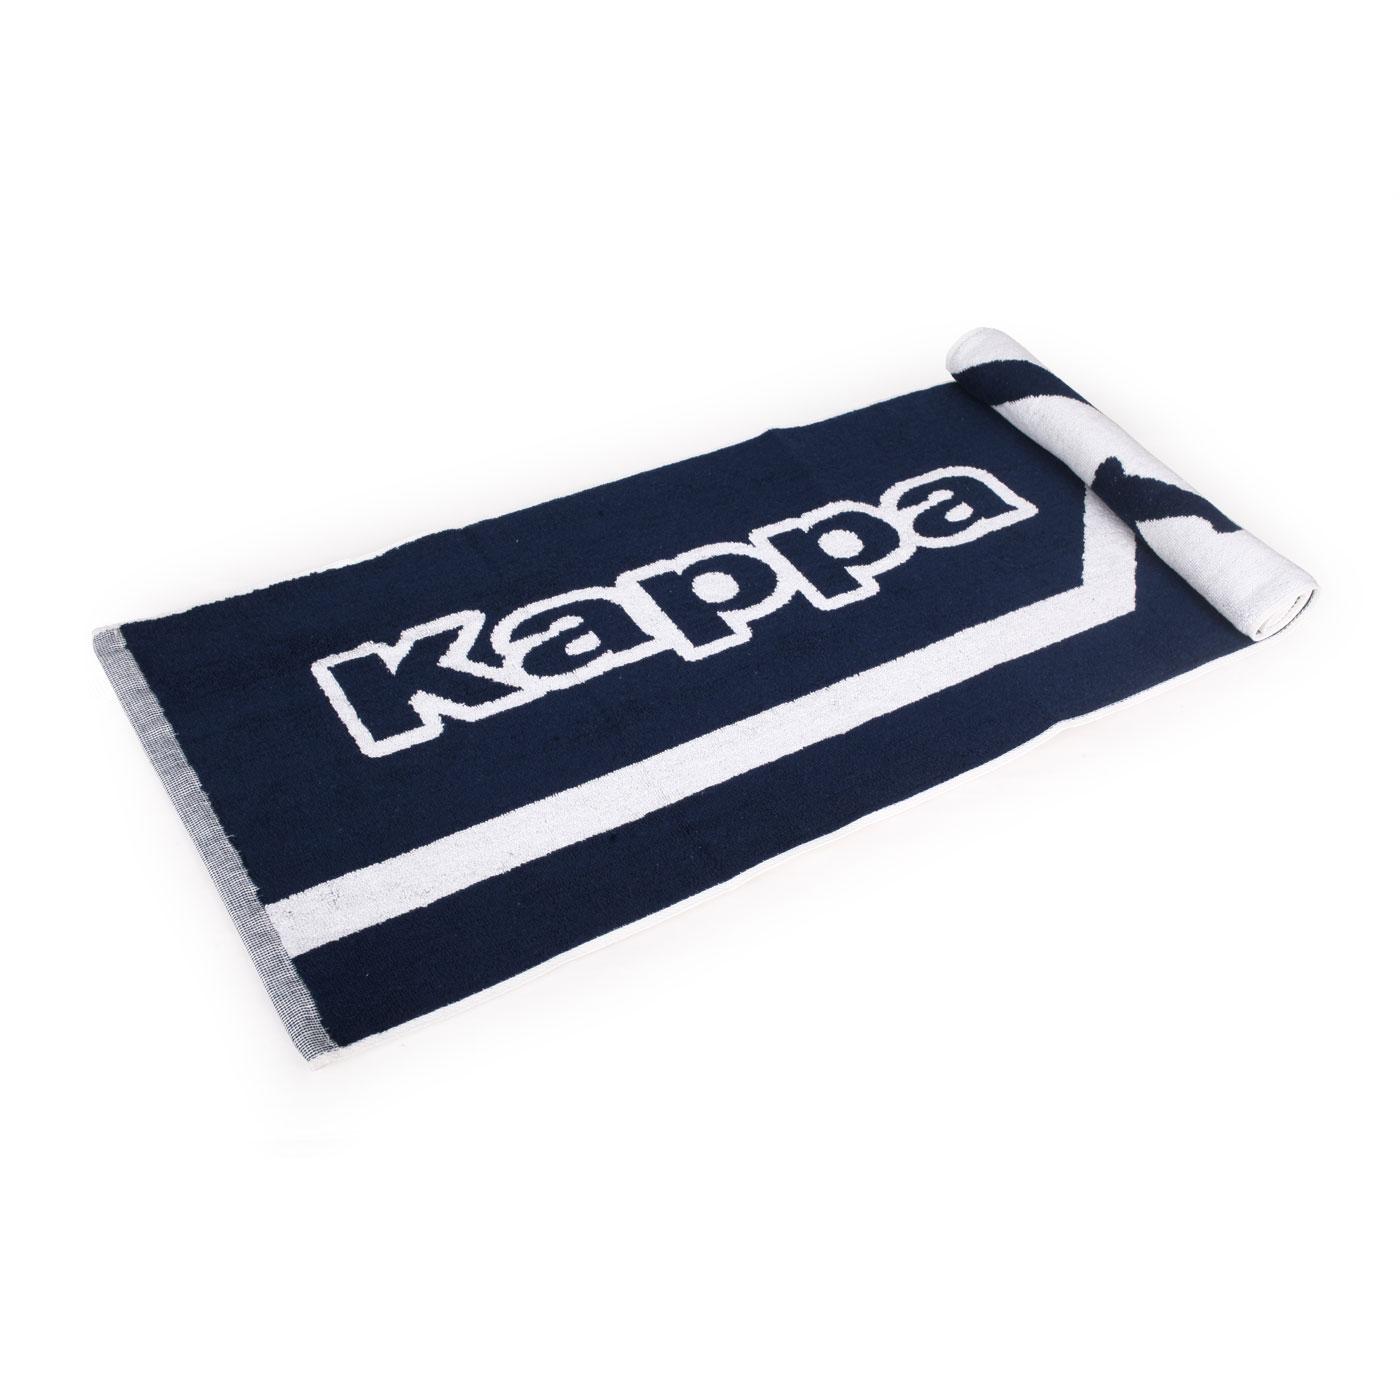 KAPPA 運動毛巾 304TTXD-915 - 丈青白